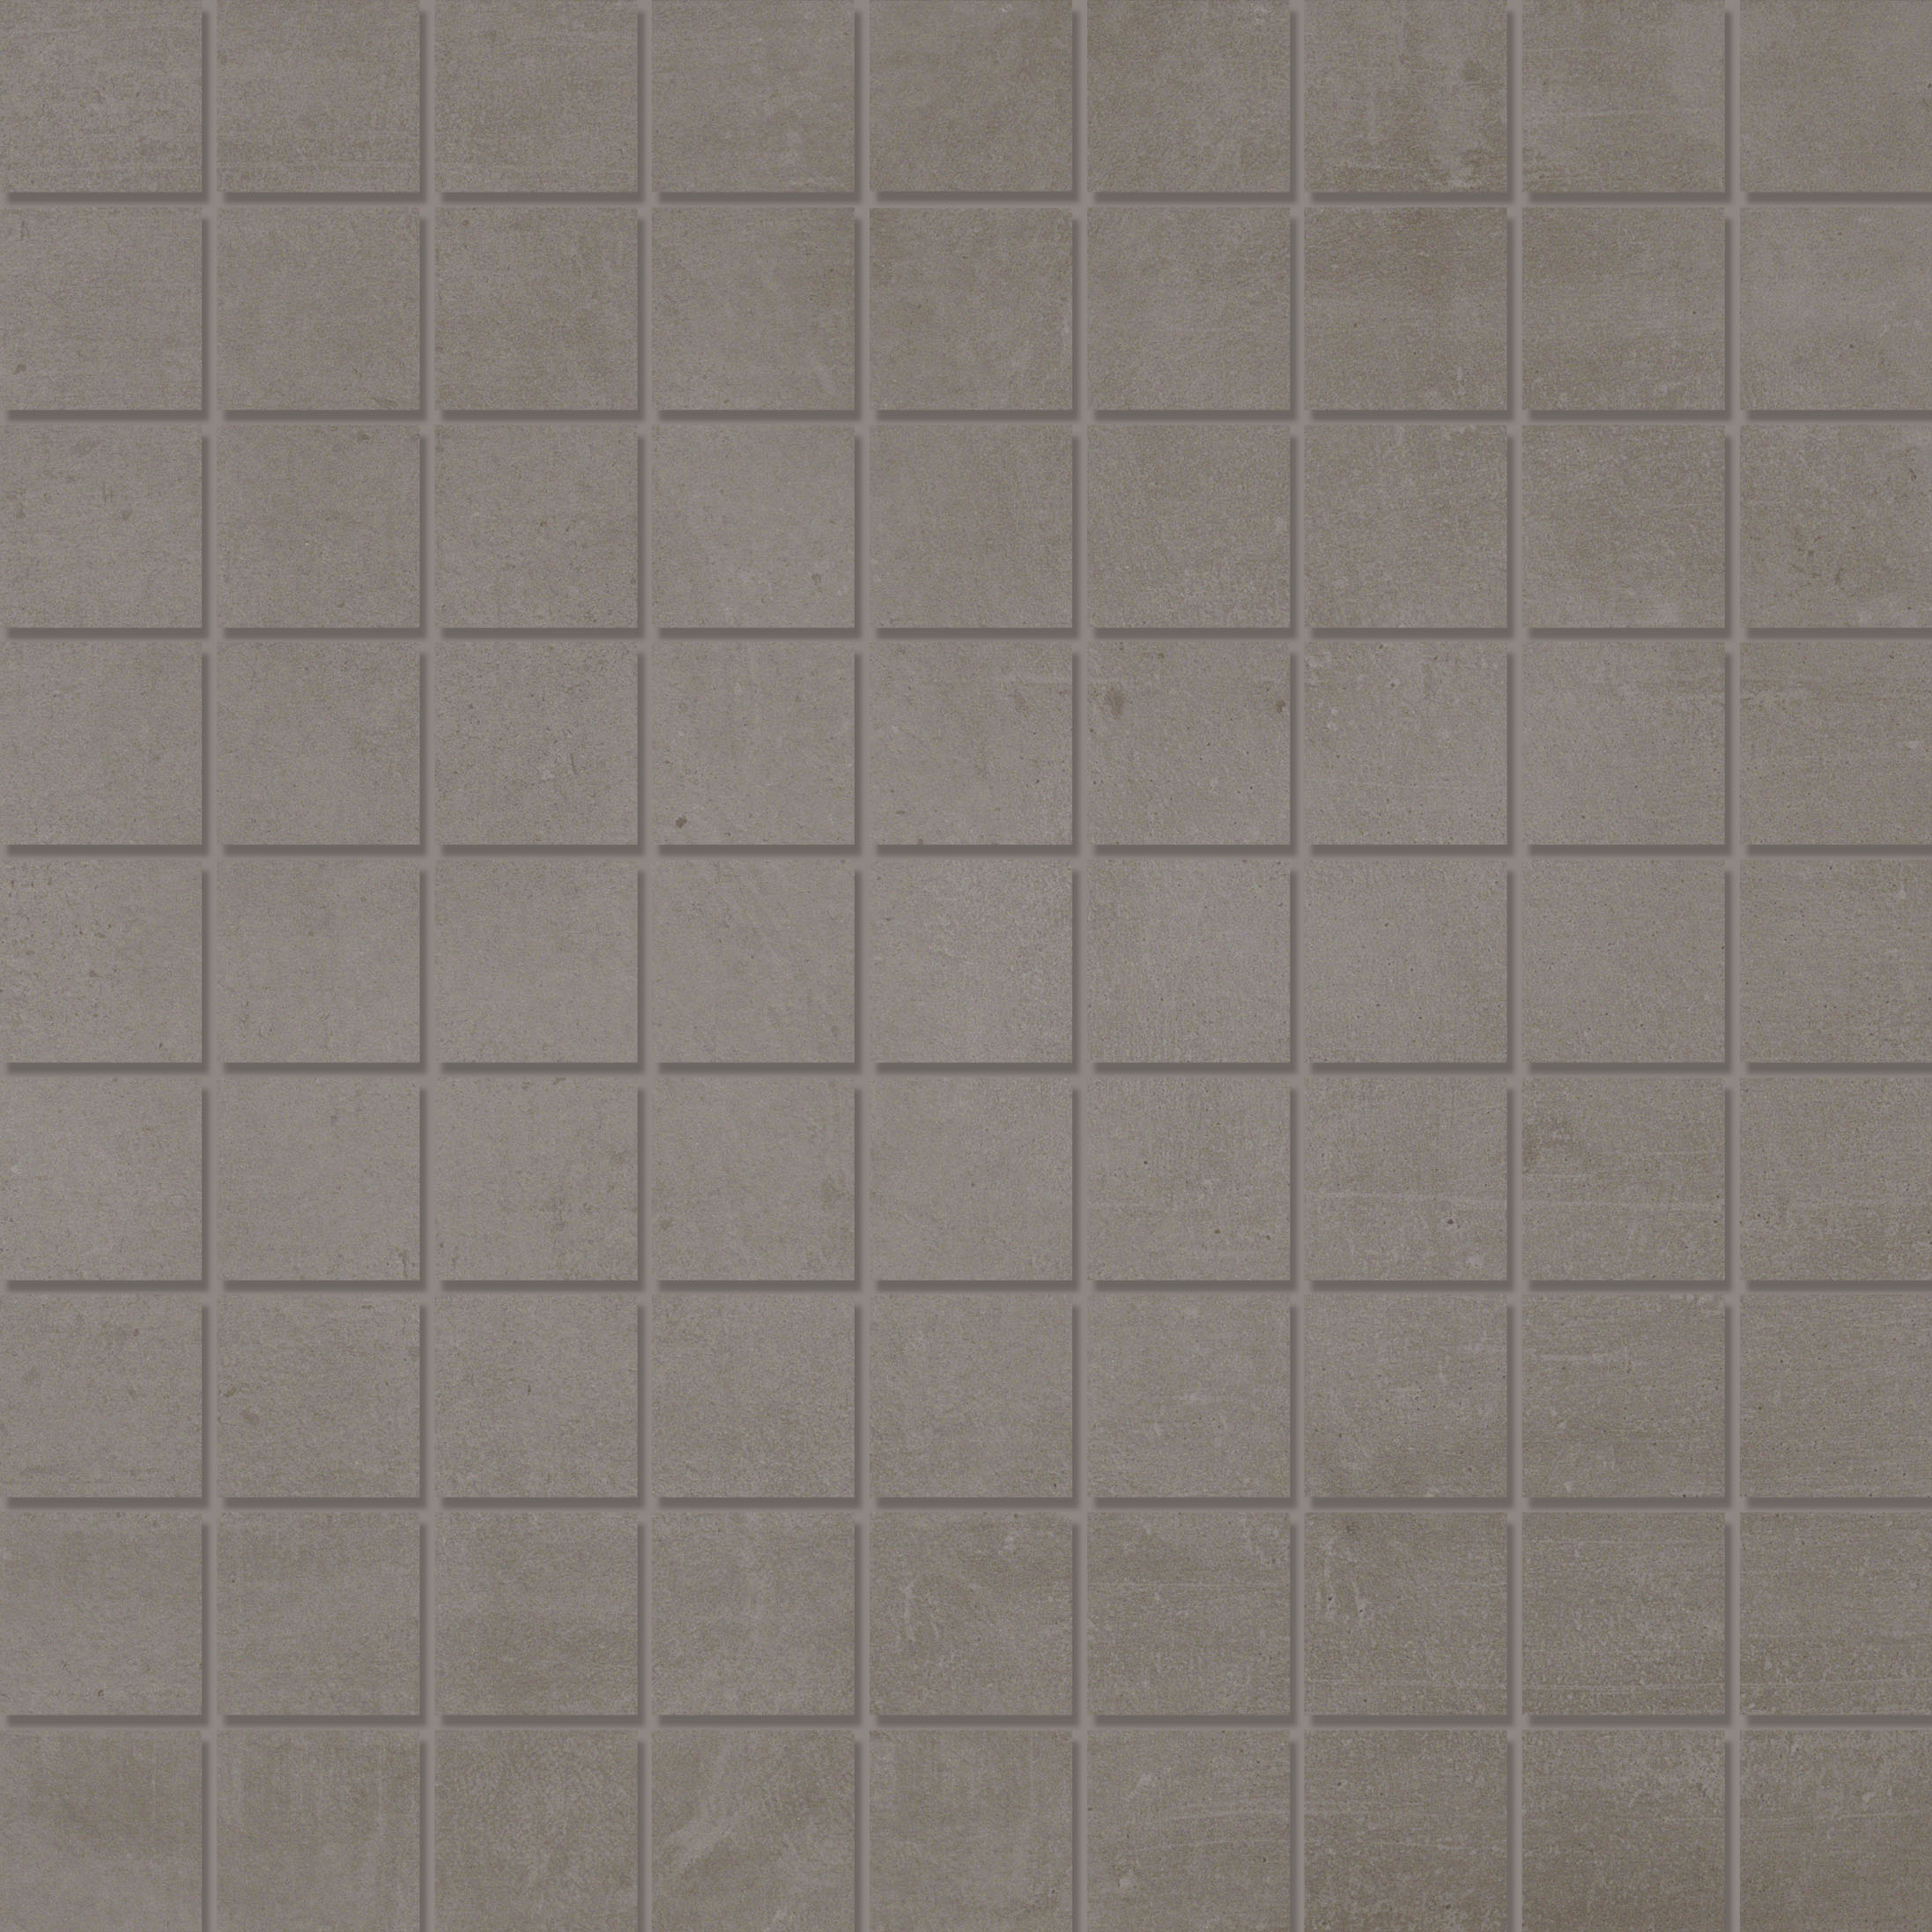 Mosaic 3,1x3,1 Dove